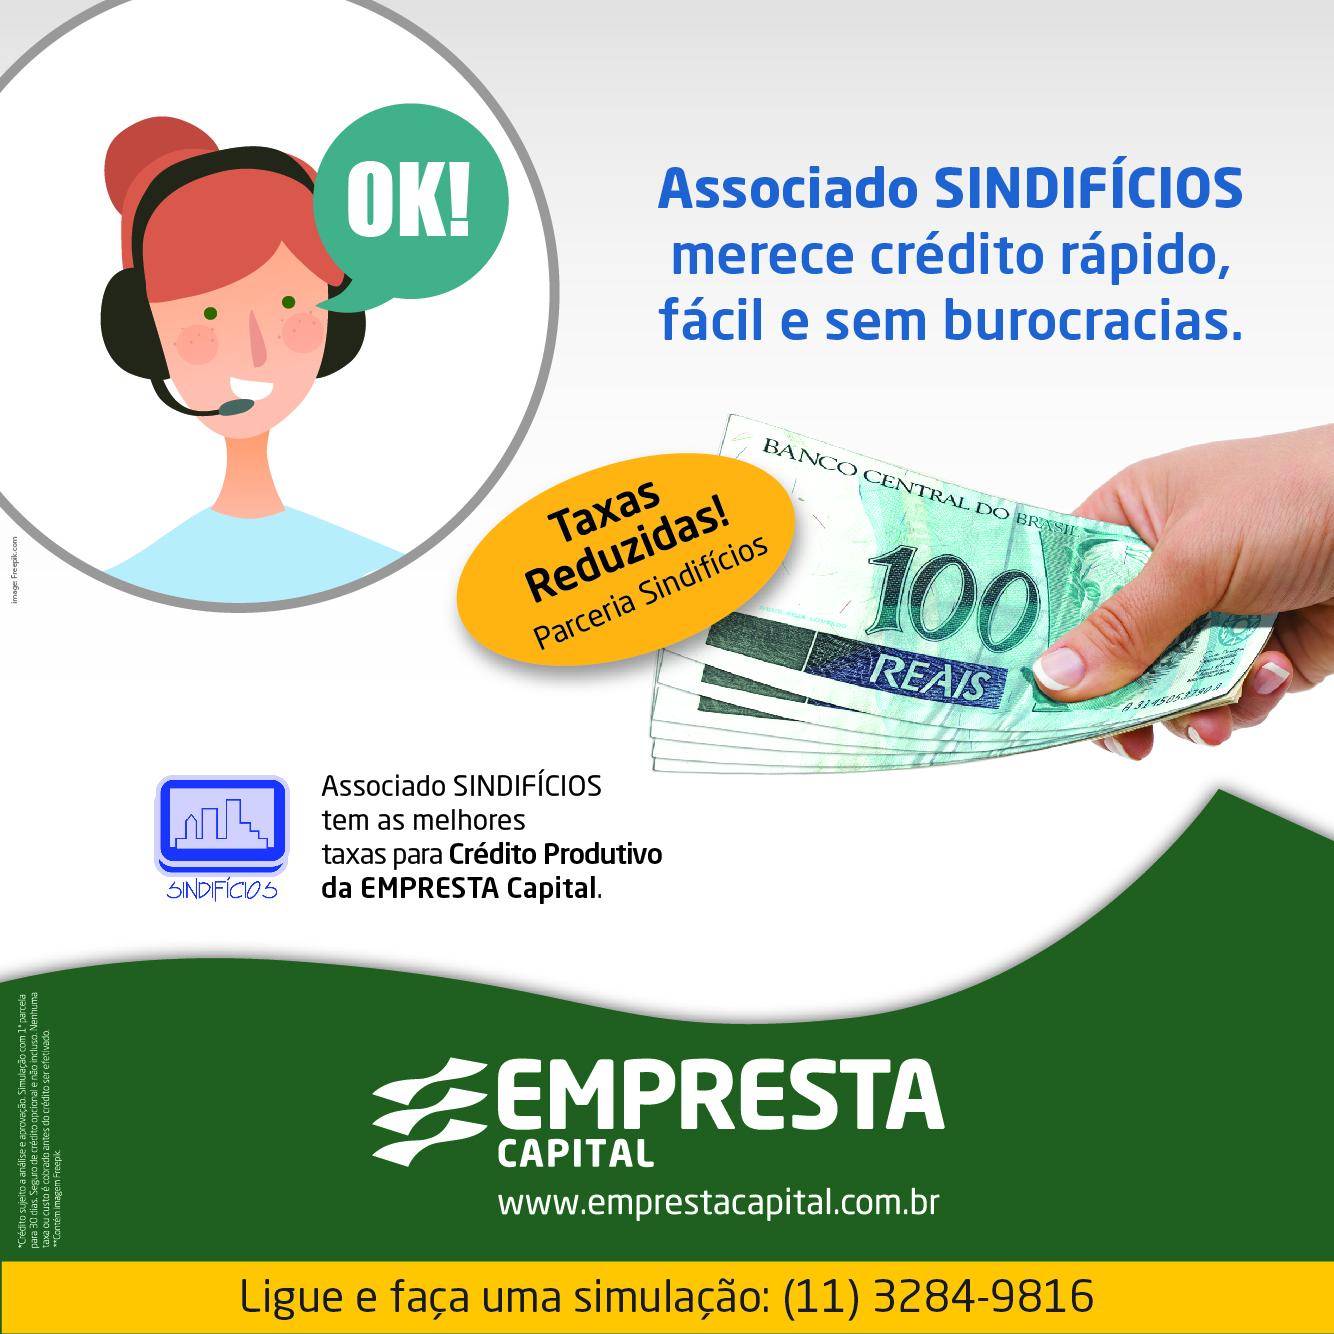 Crédito rápido e sem burocracia